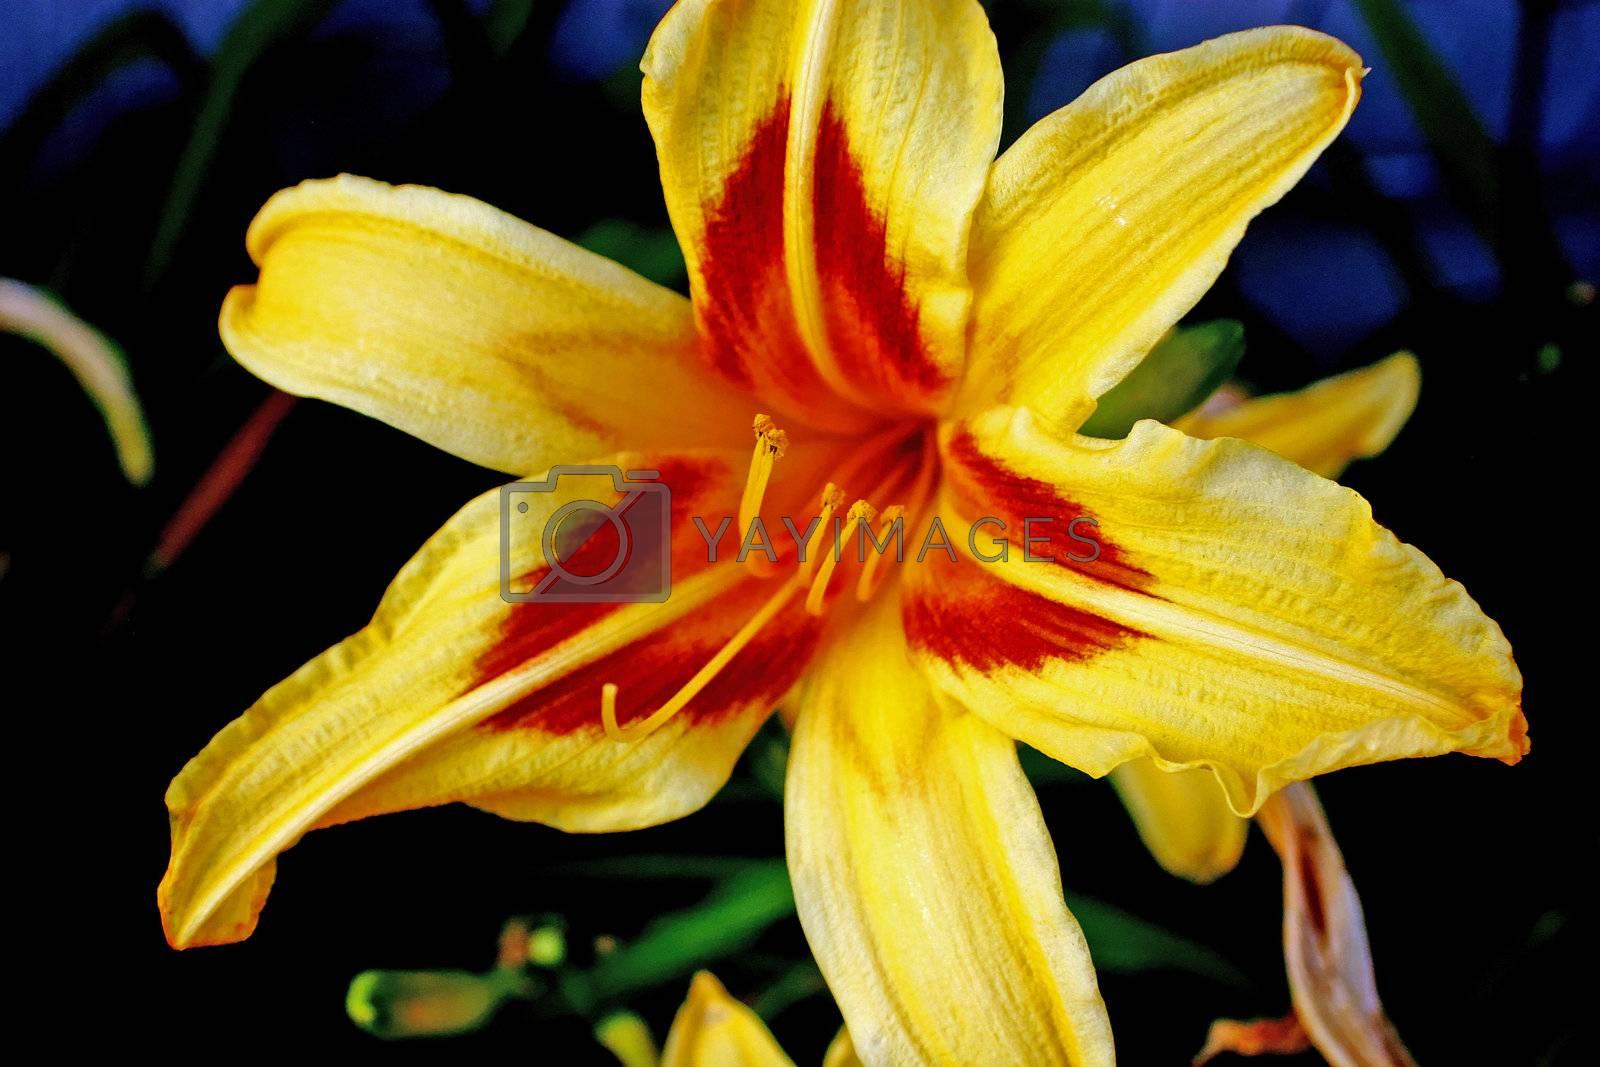 Details from golden Orchid flower from garden